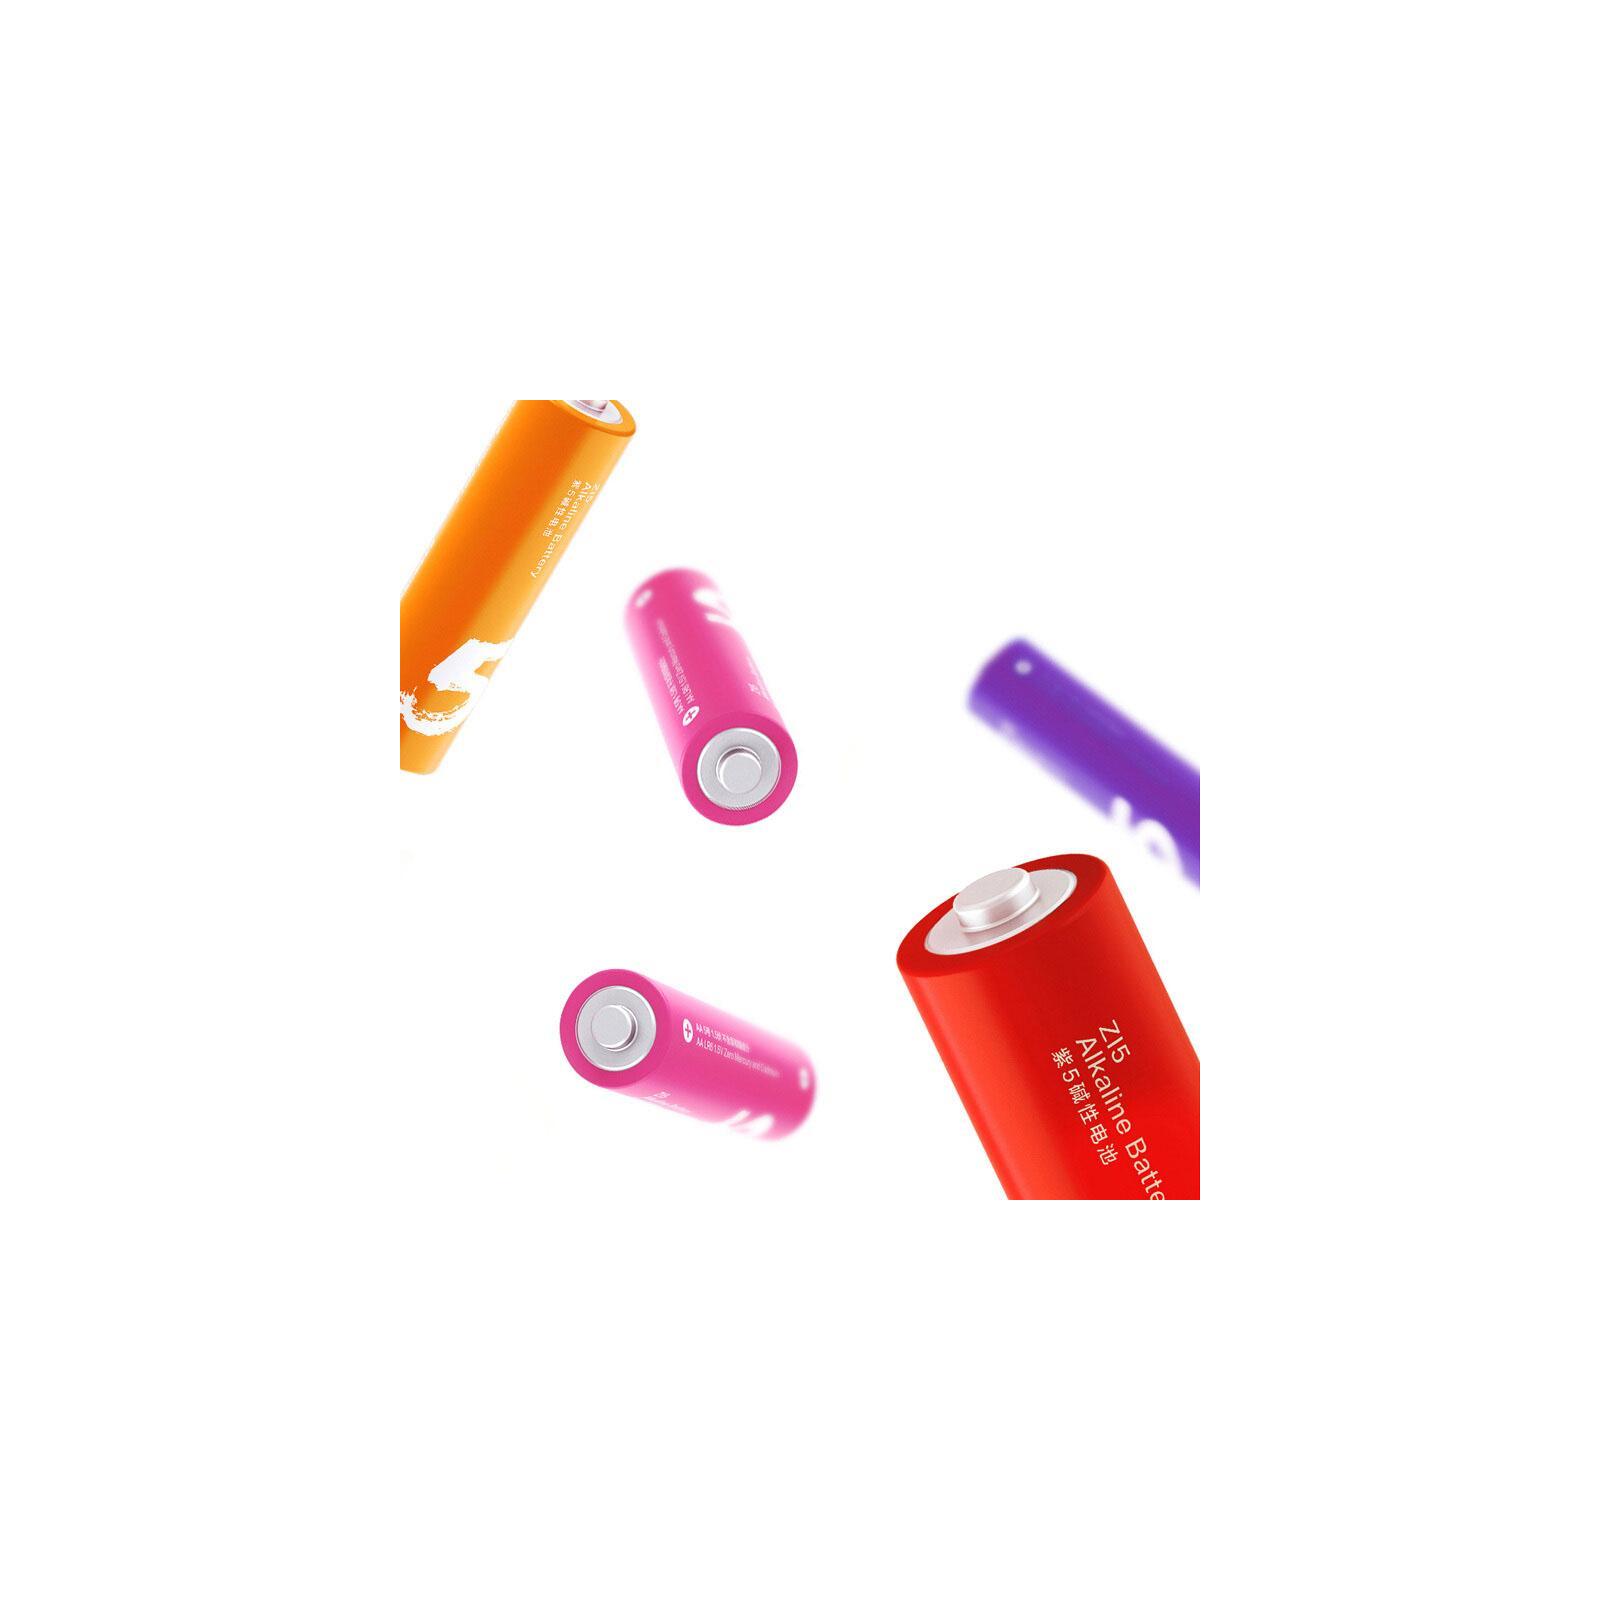 Батарейка ZMI ZI5 Rainbow AA batteries * 40 (Ф01152) изображение 4